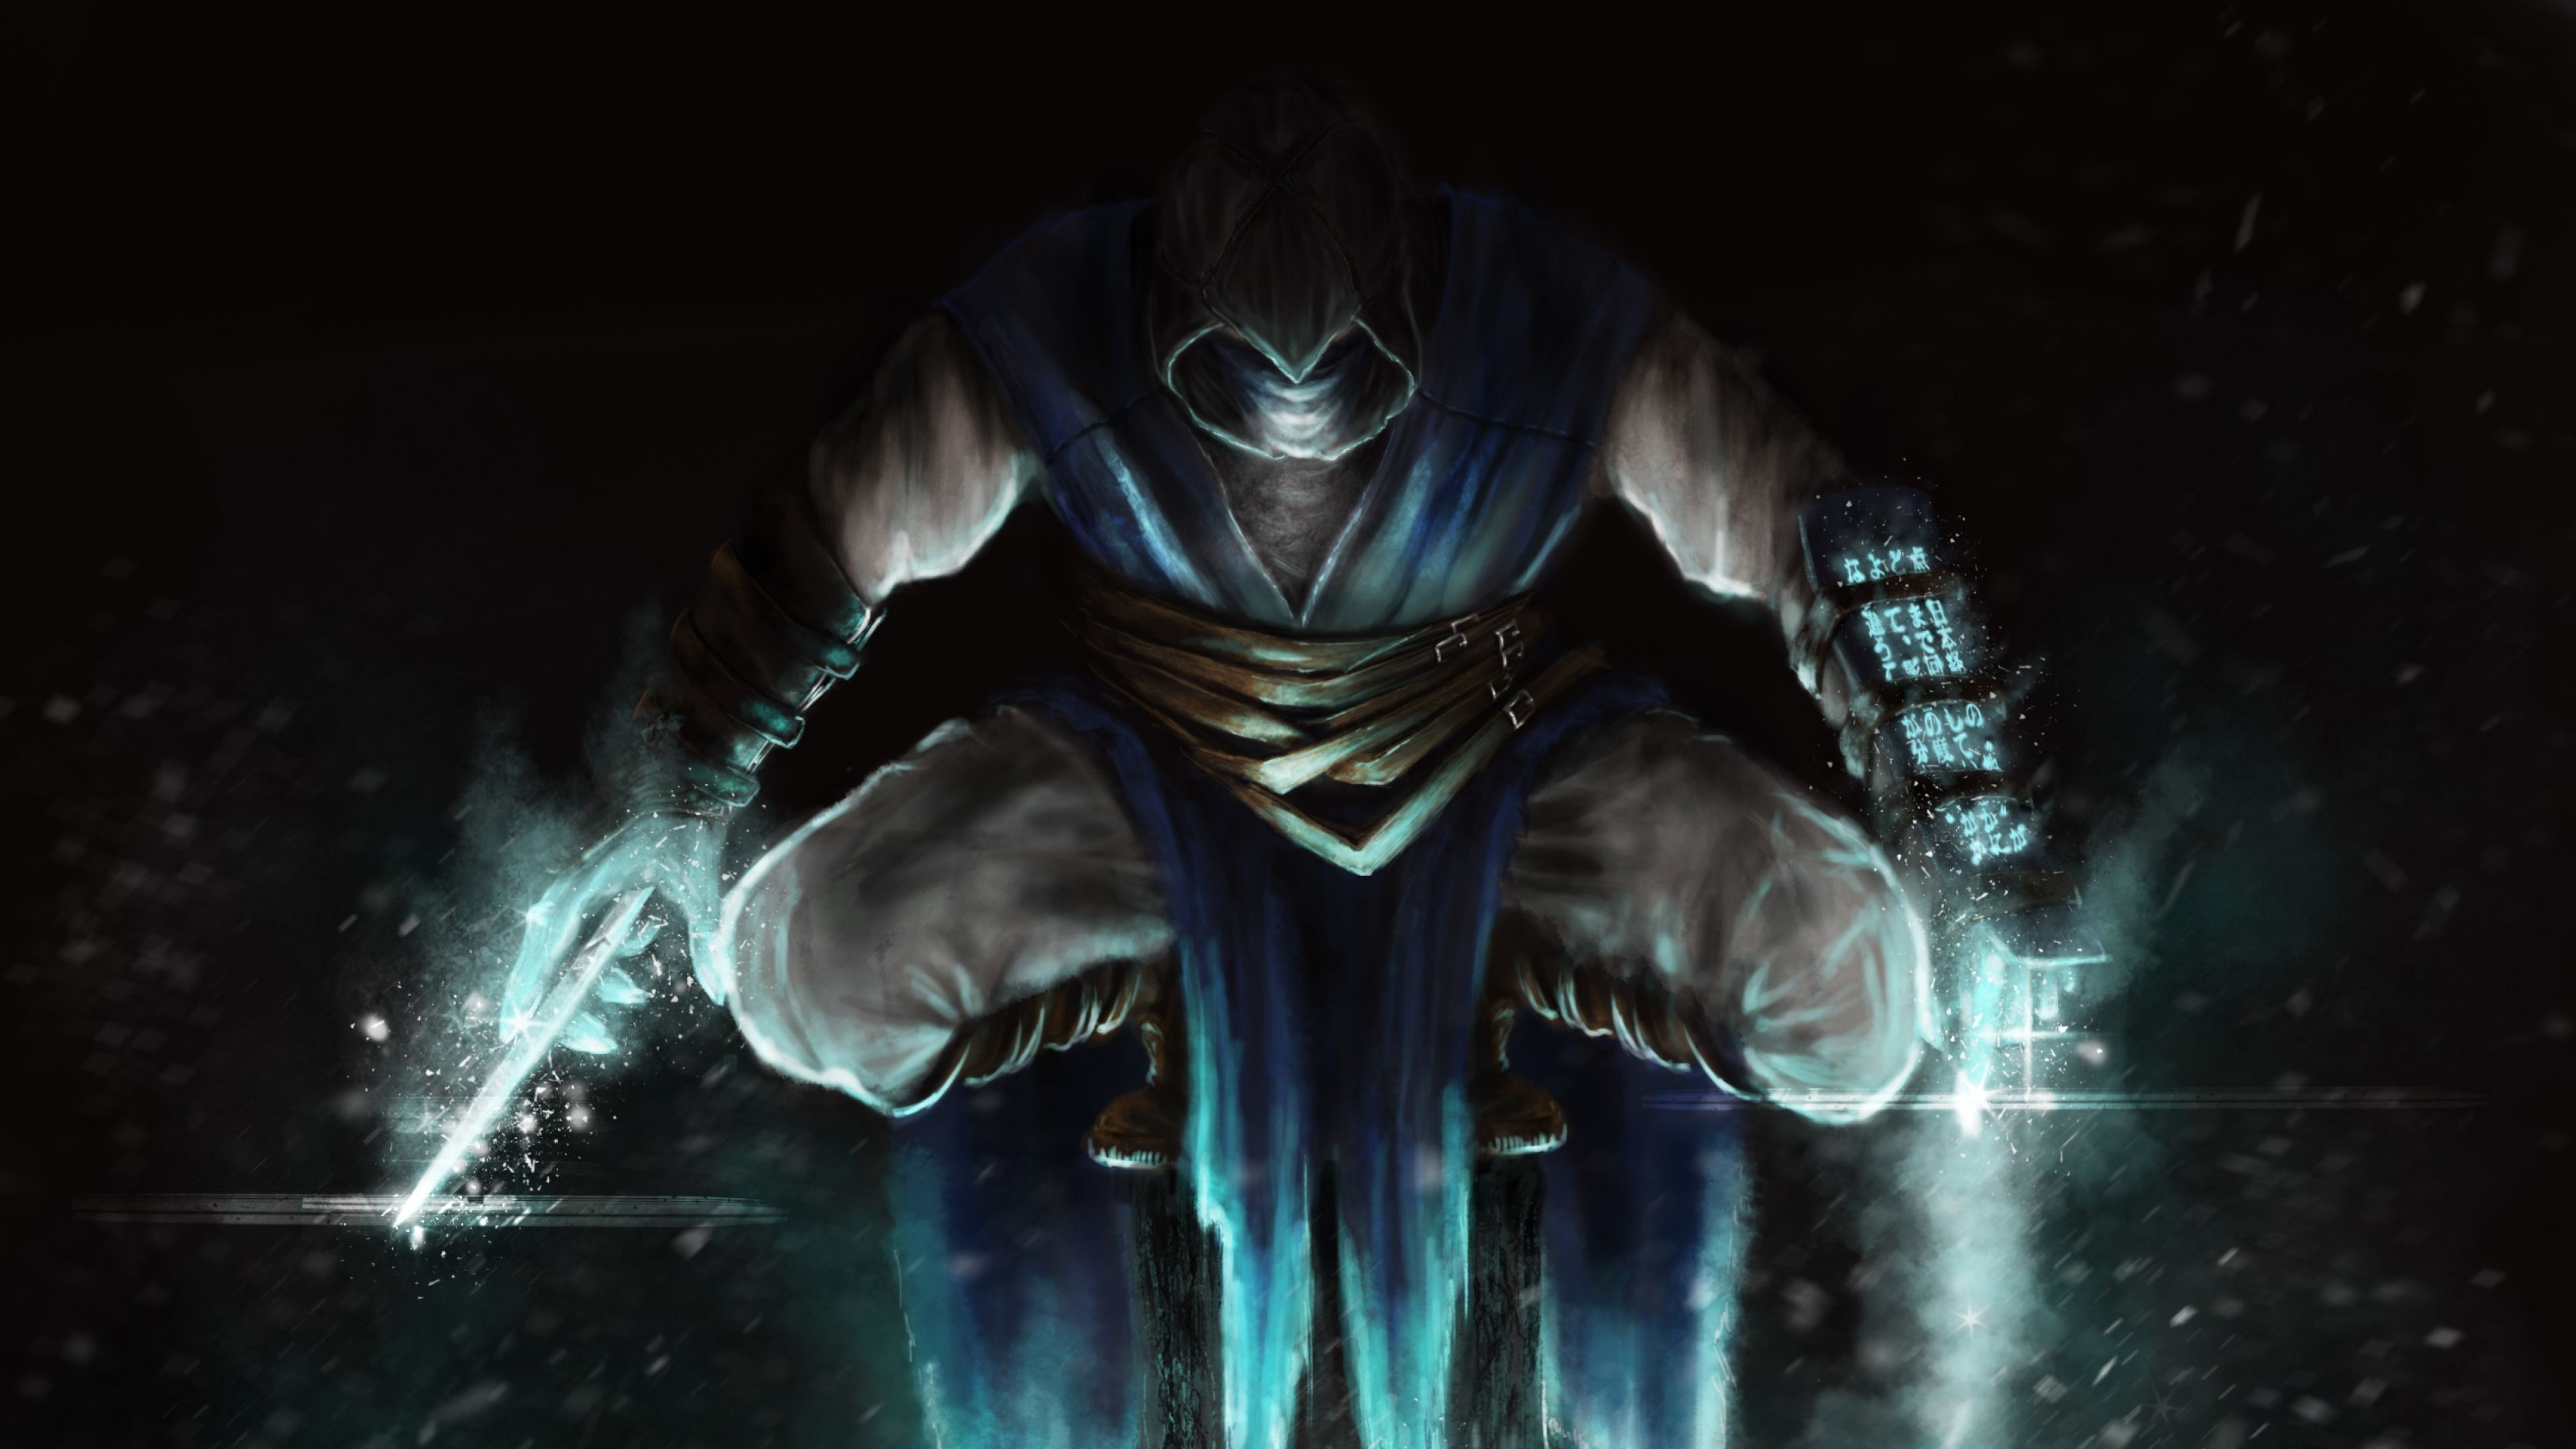 Download Wallpaper Mortal kombat, Sub-zero, Jump, Art 4K .